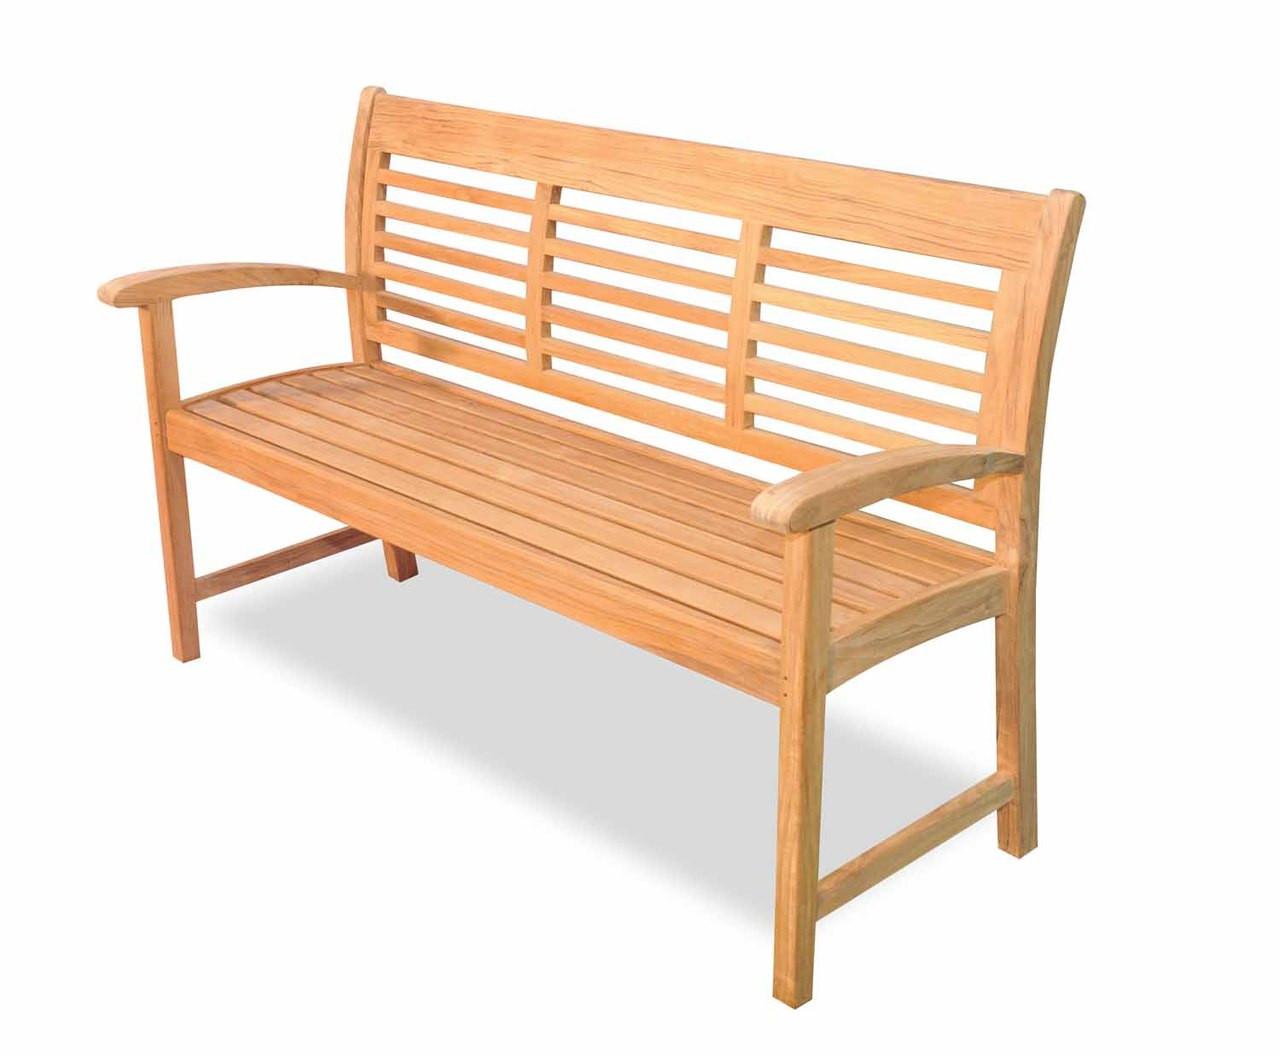 Westerly 5 Ft Teak Bench By Regal Teak Great Garden Supply